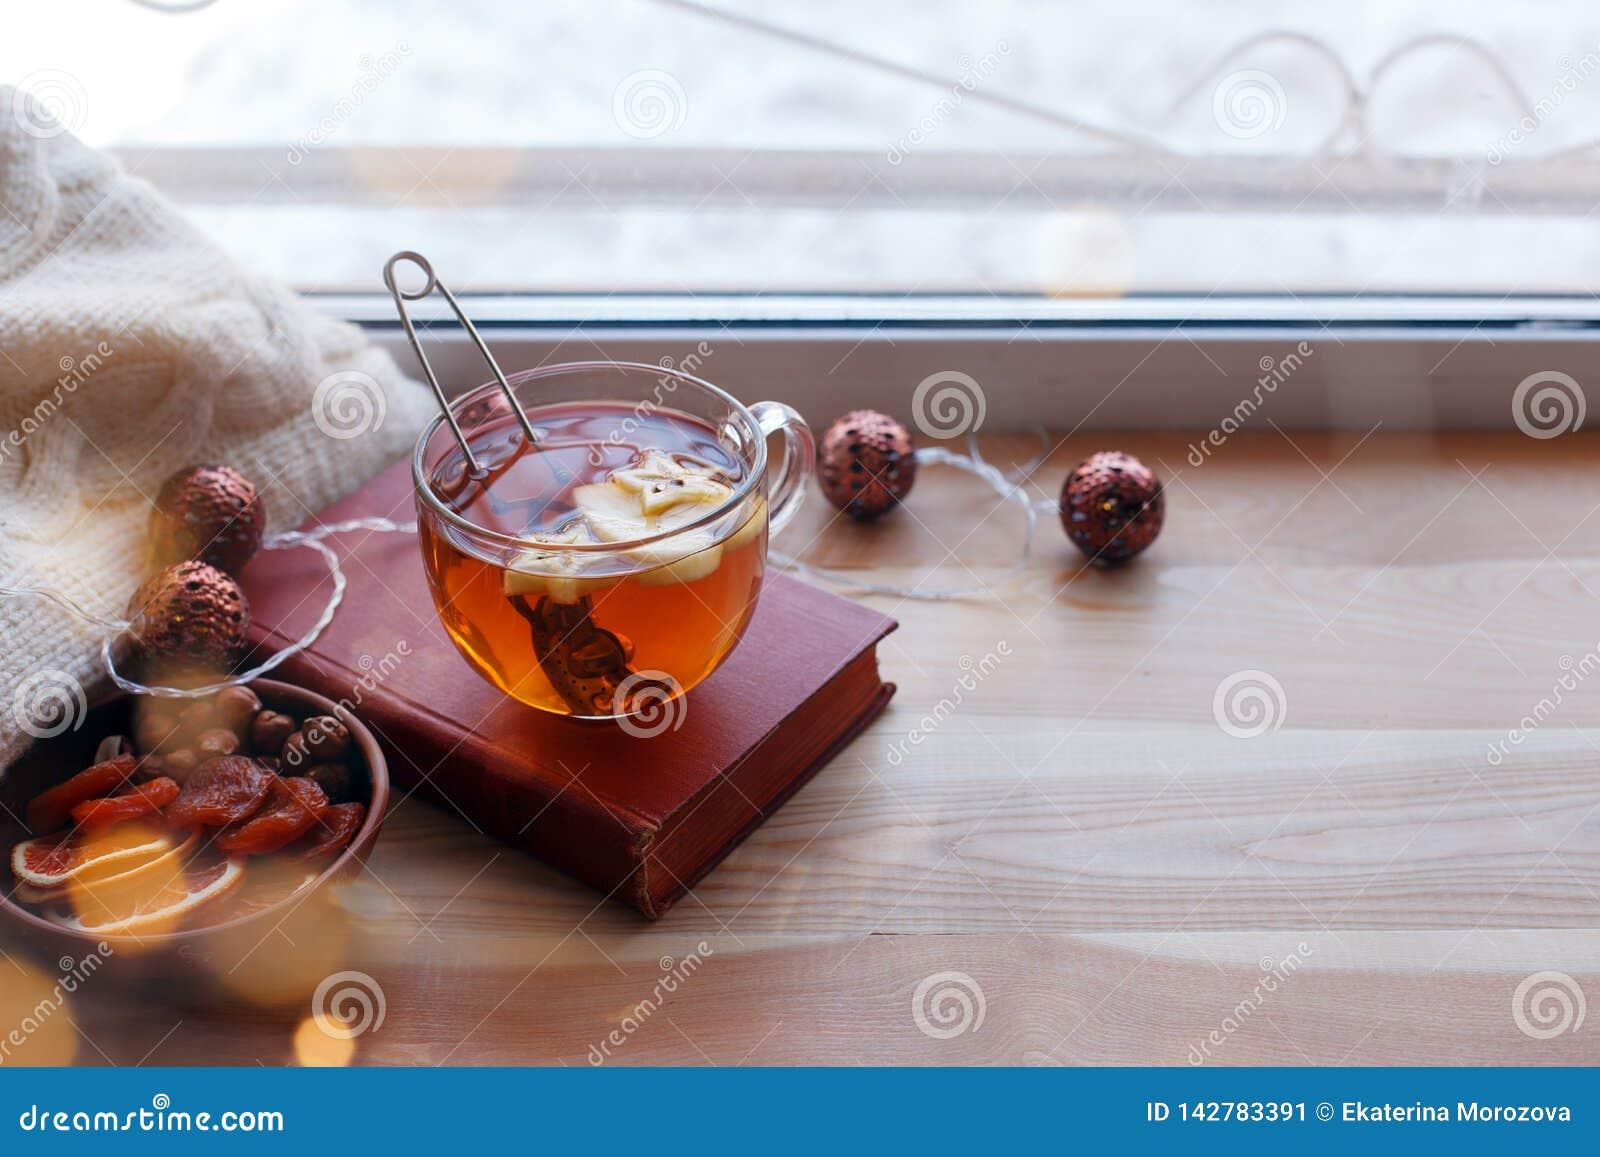 Cup of tea, book, warm pillow, garland light on wooden window sill, Moody seasonal still life. Warm tones, horizontal, copy space